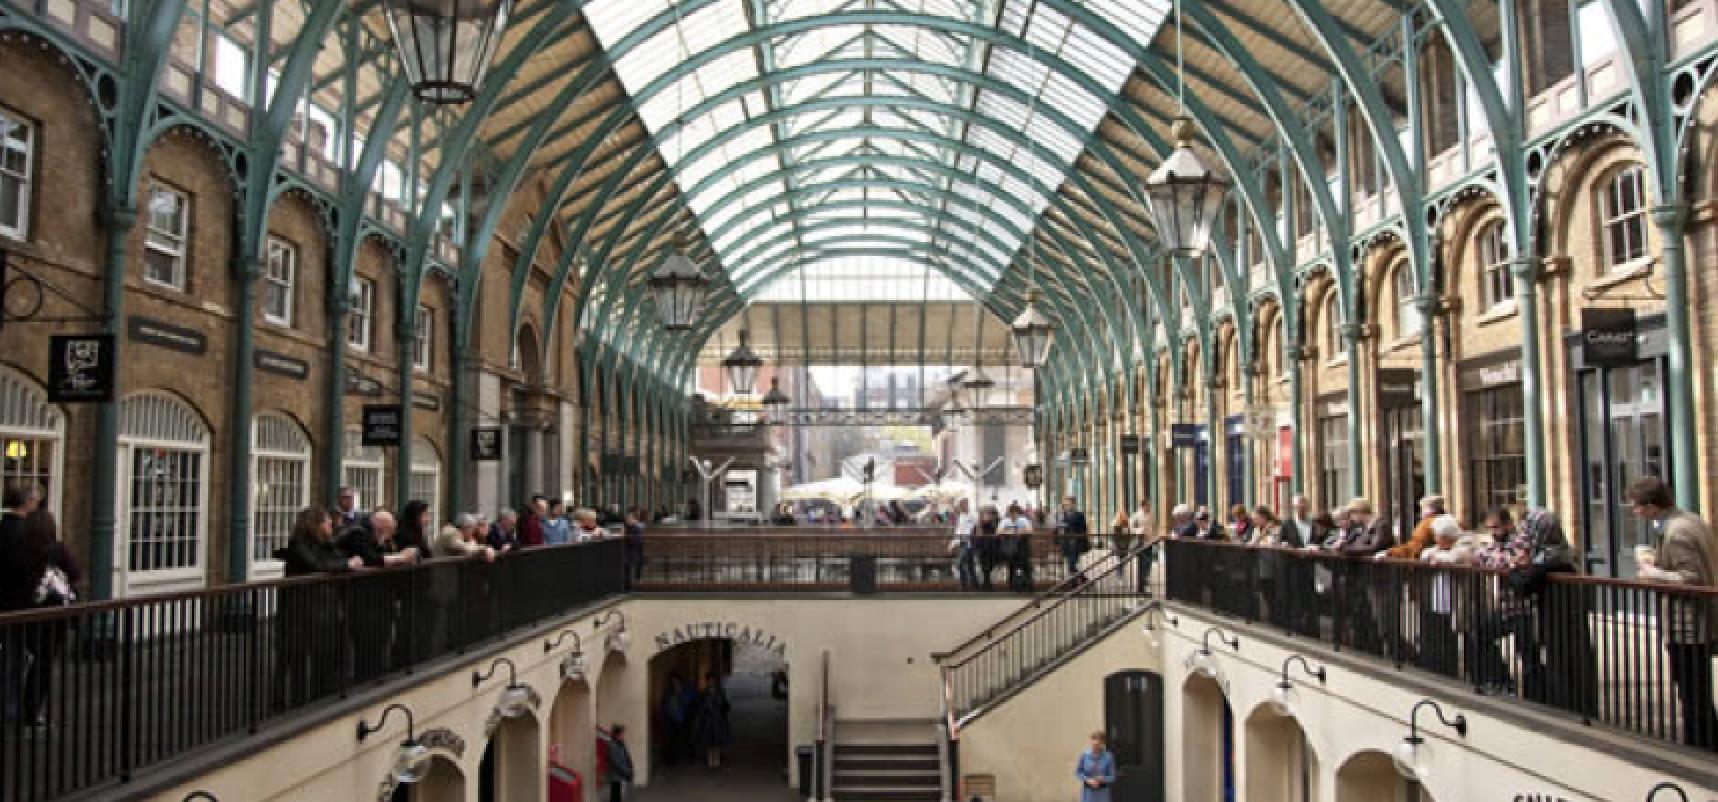 covent garden - 10 mercados londinenses que merecen una visita